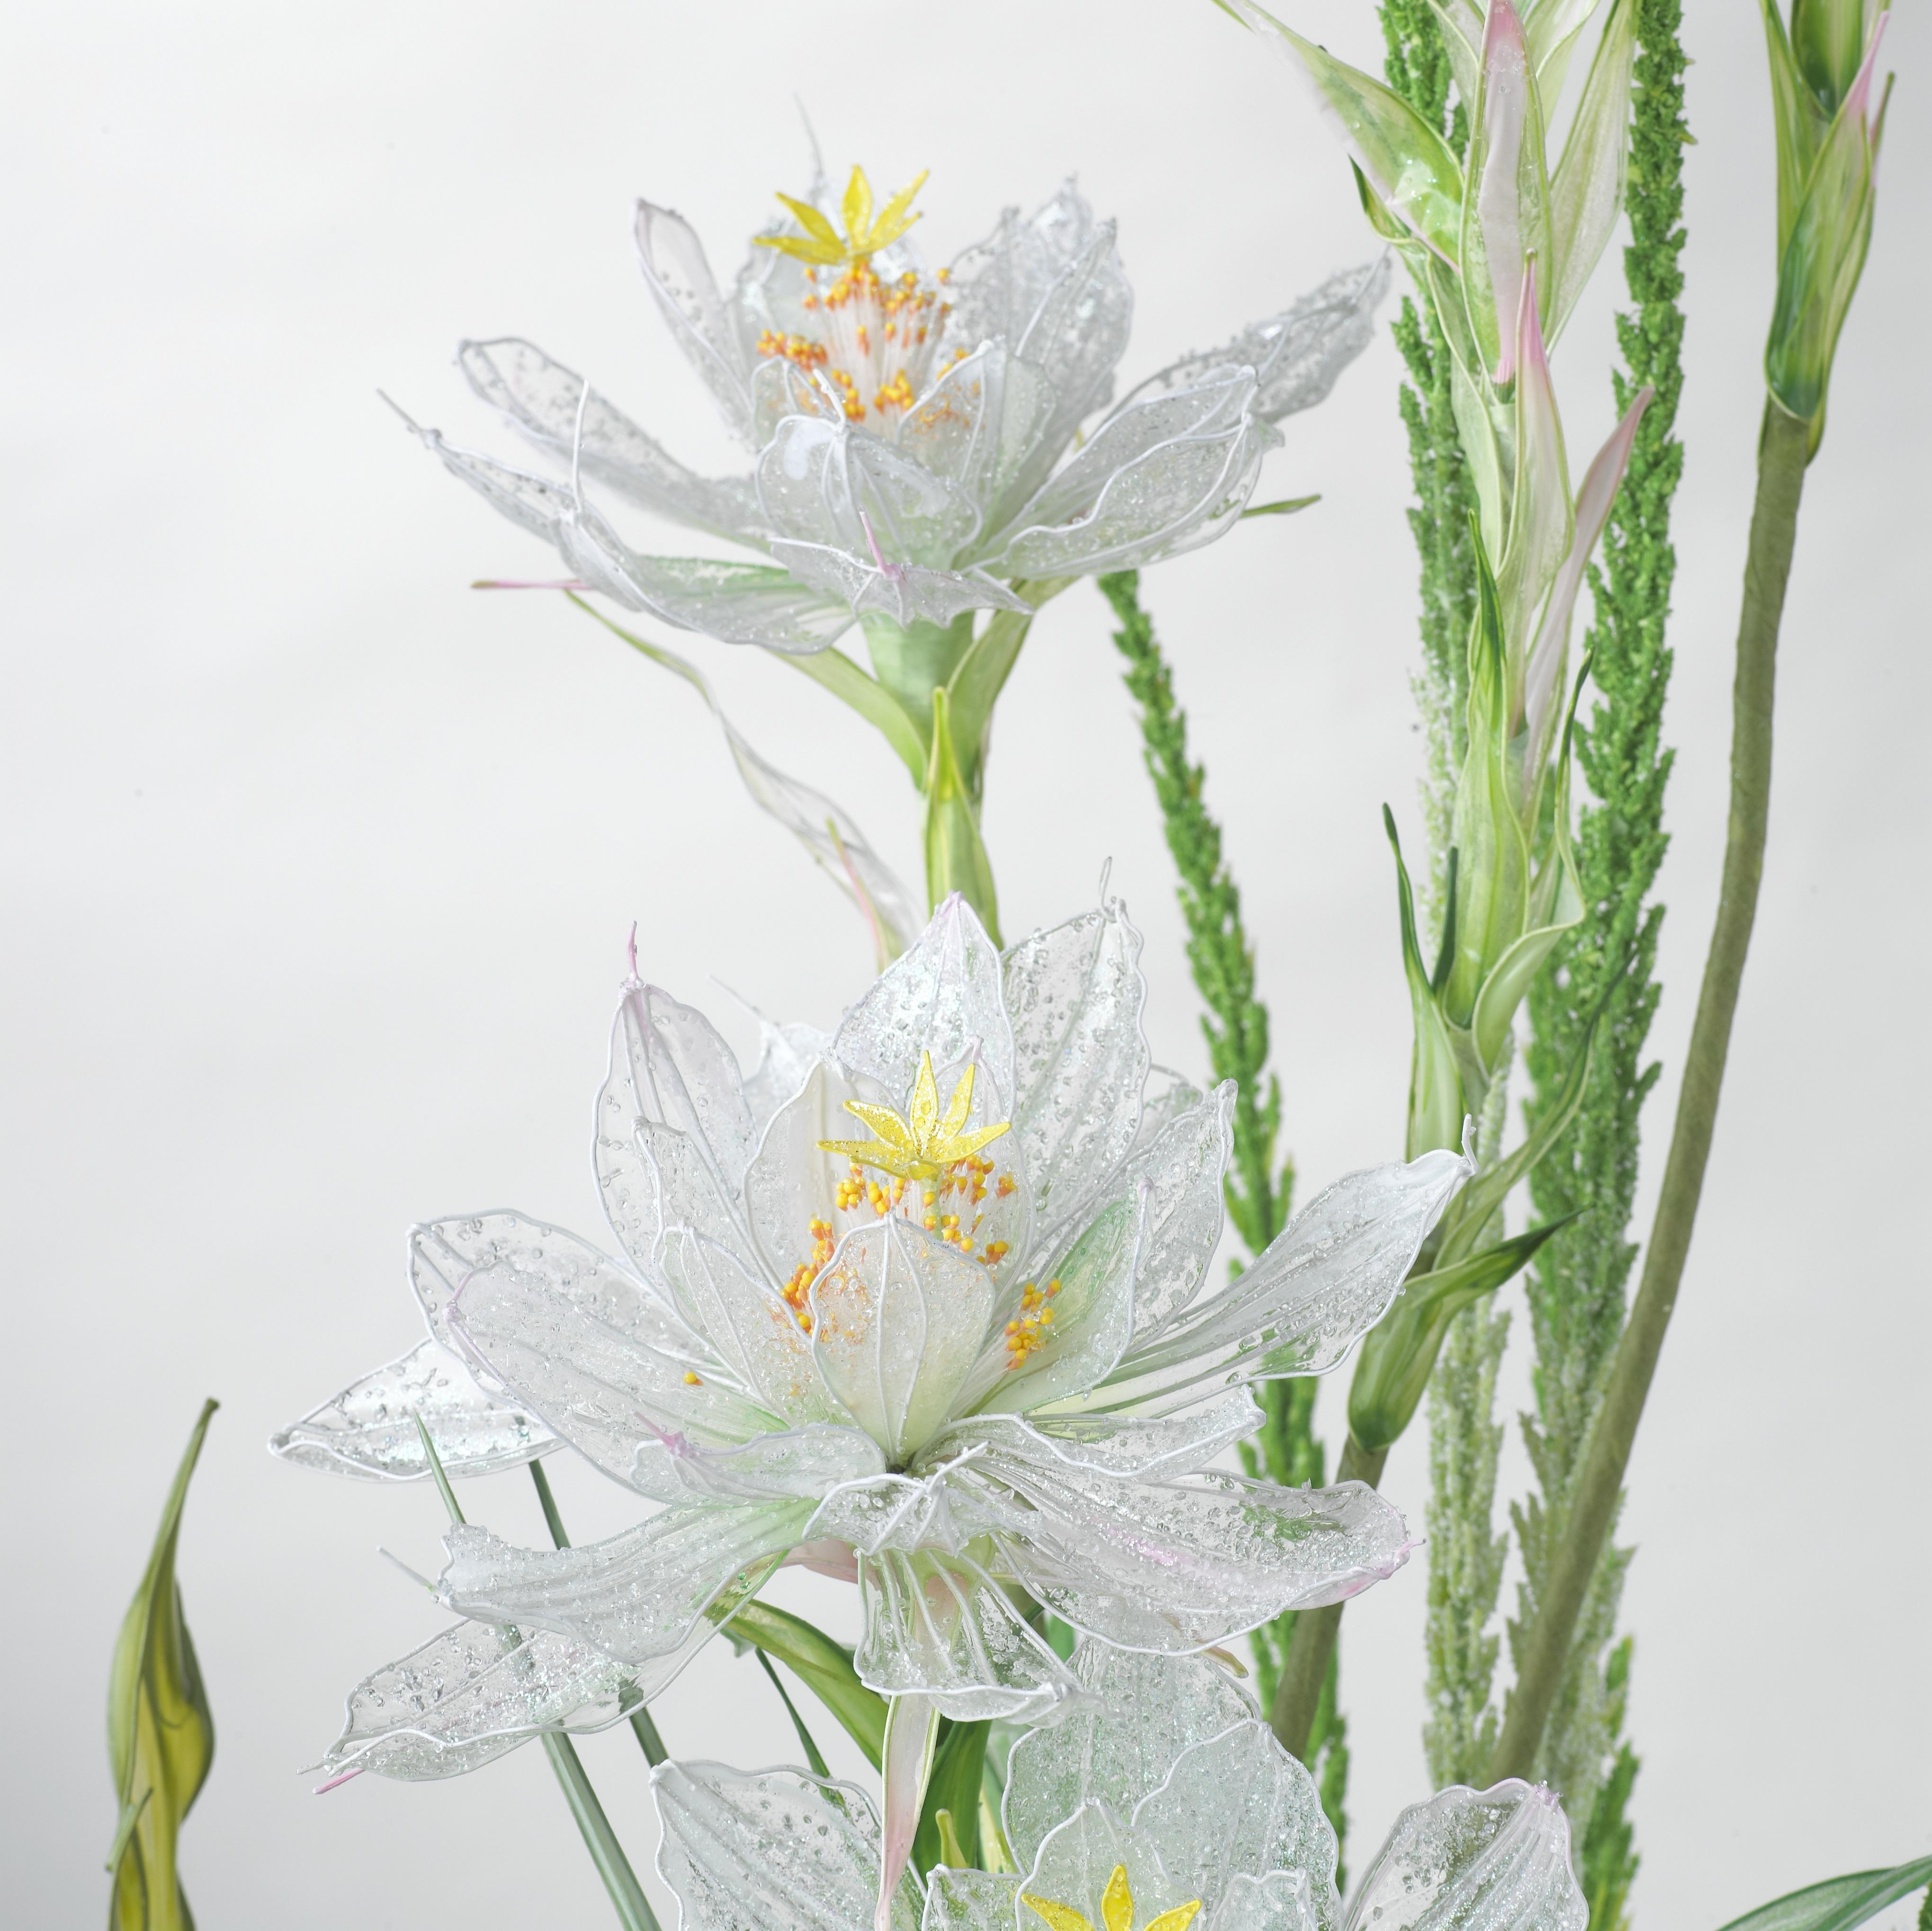 Free Images Branch Blossom Plastic Vase Decoration Botany